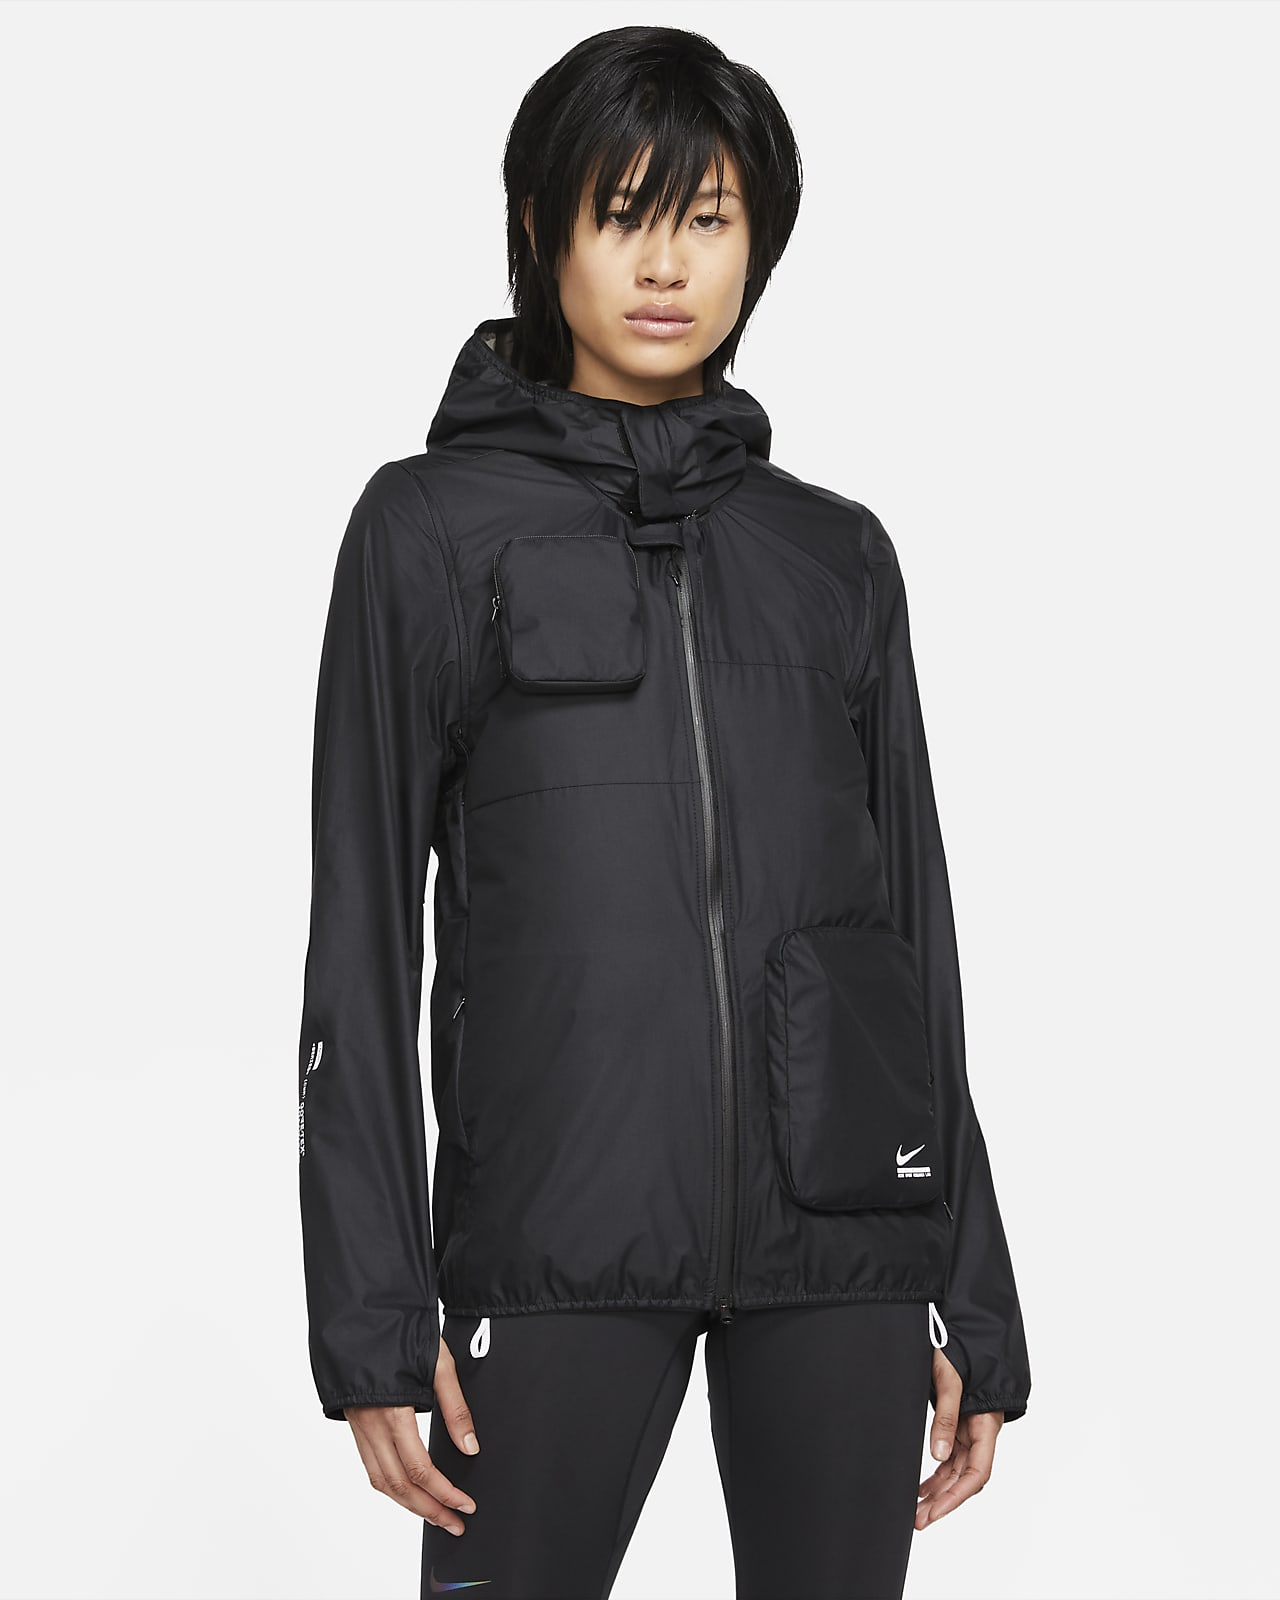 Nike NSRL Women's Transform Jacket